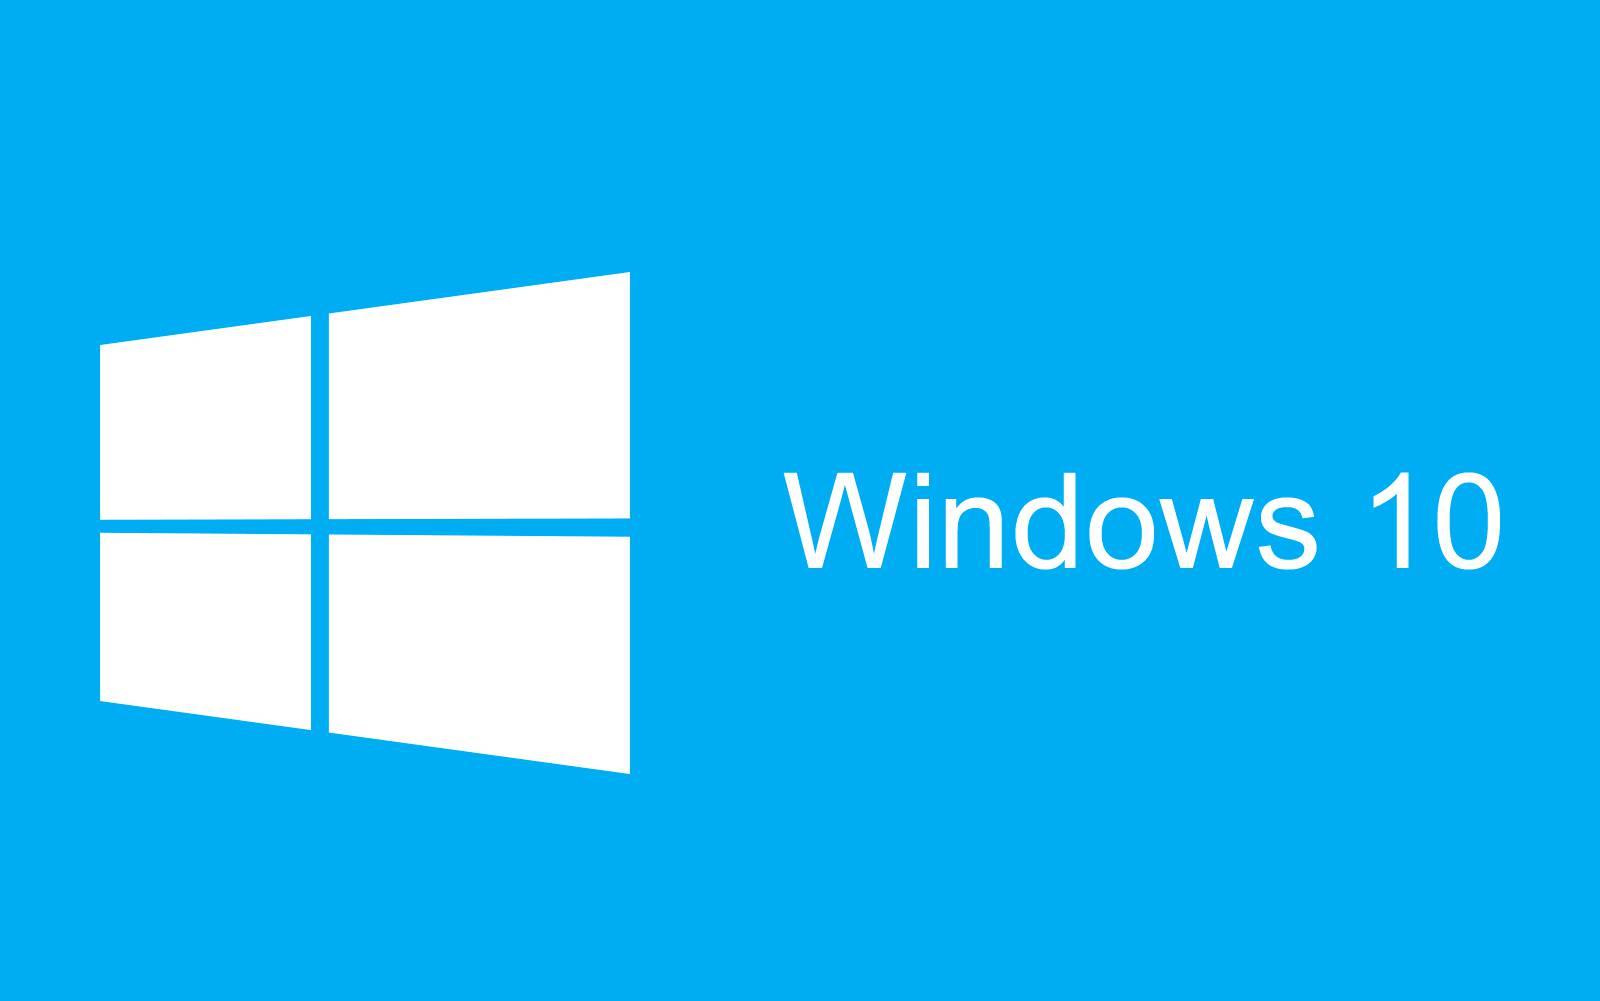 Windows 10 decizie 20h1